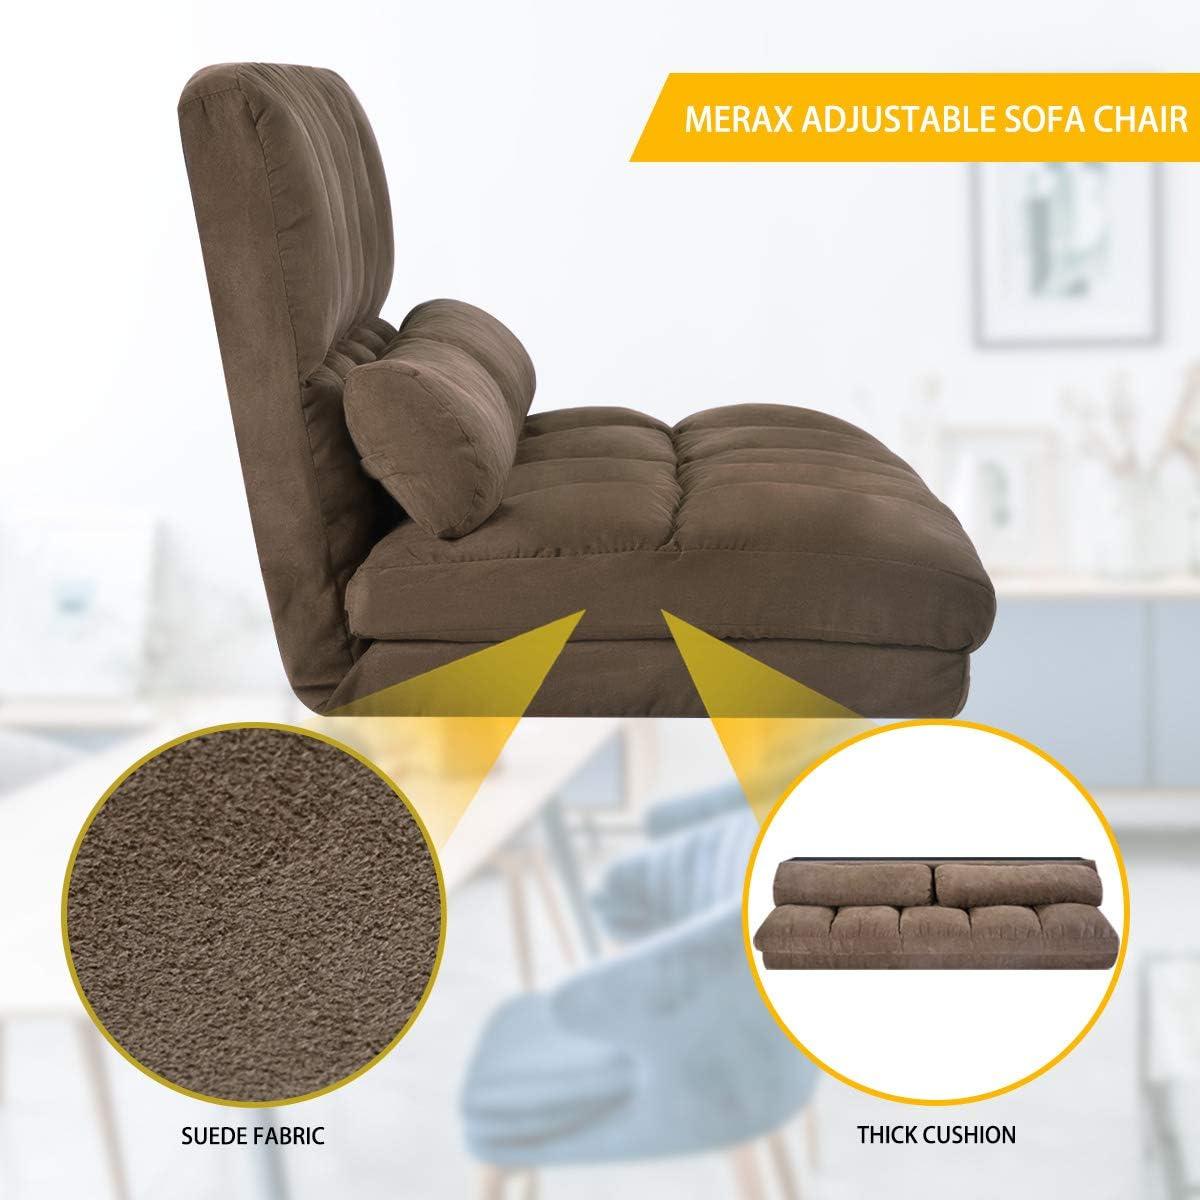 Merax Floor Sofa Bed, Foldable Sleeper Sofa Bed, Adjustable Fabric Folding Lazy Sofa Floor Sofa Couch with 2 Pillows Brown